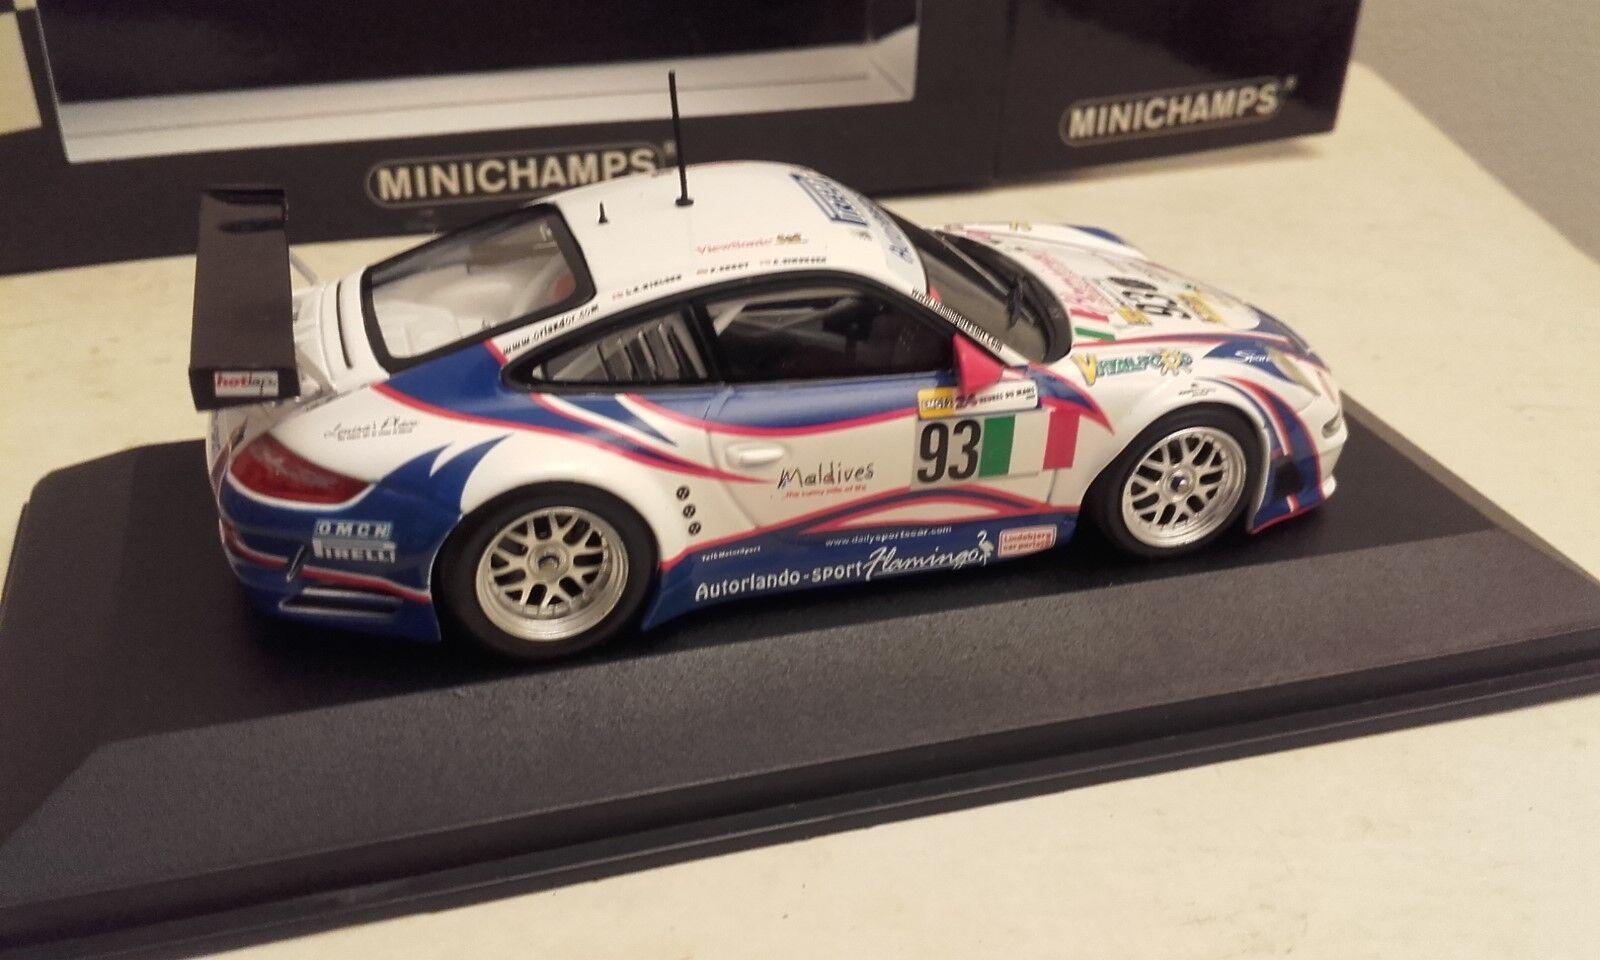 PORSCHE 911 911 911 GT3 RSR 24 heures du mans 2007 minichamps 426999